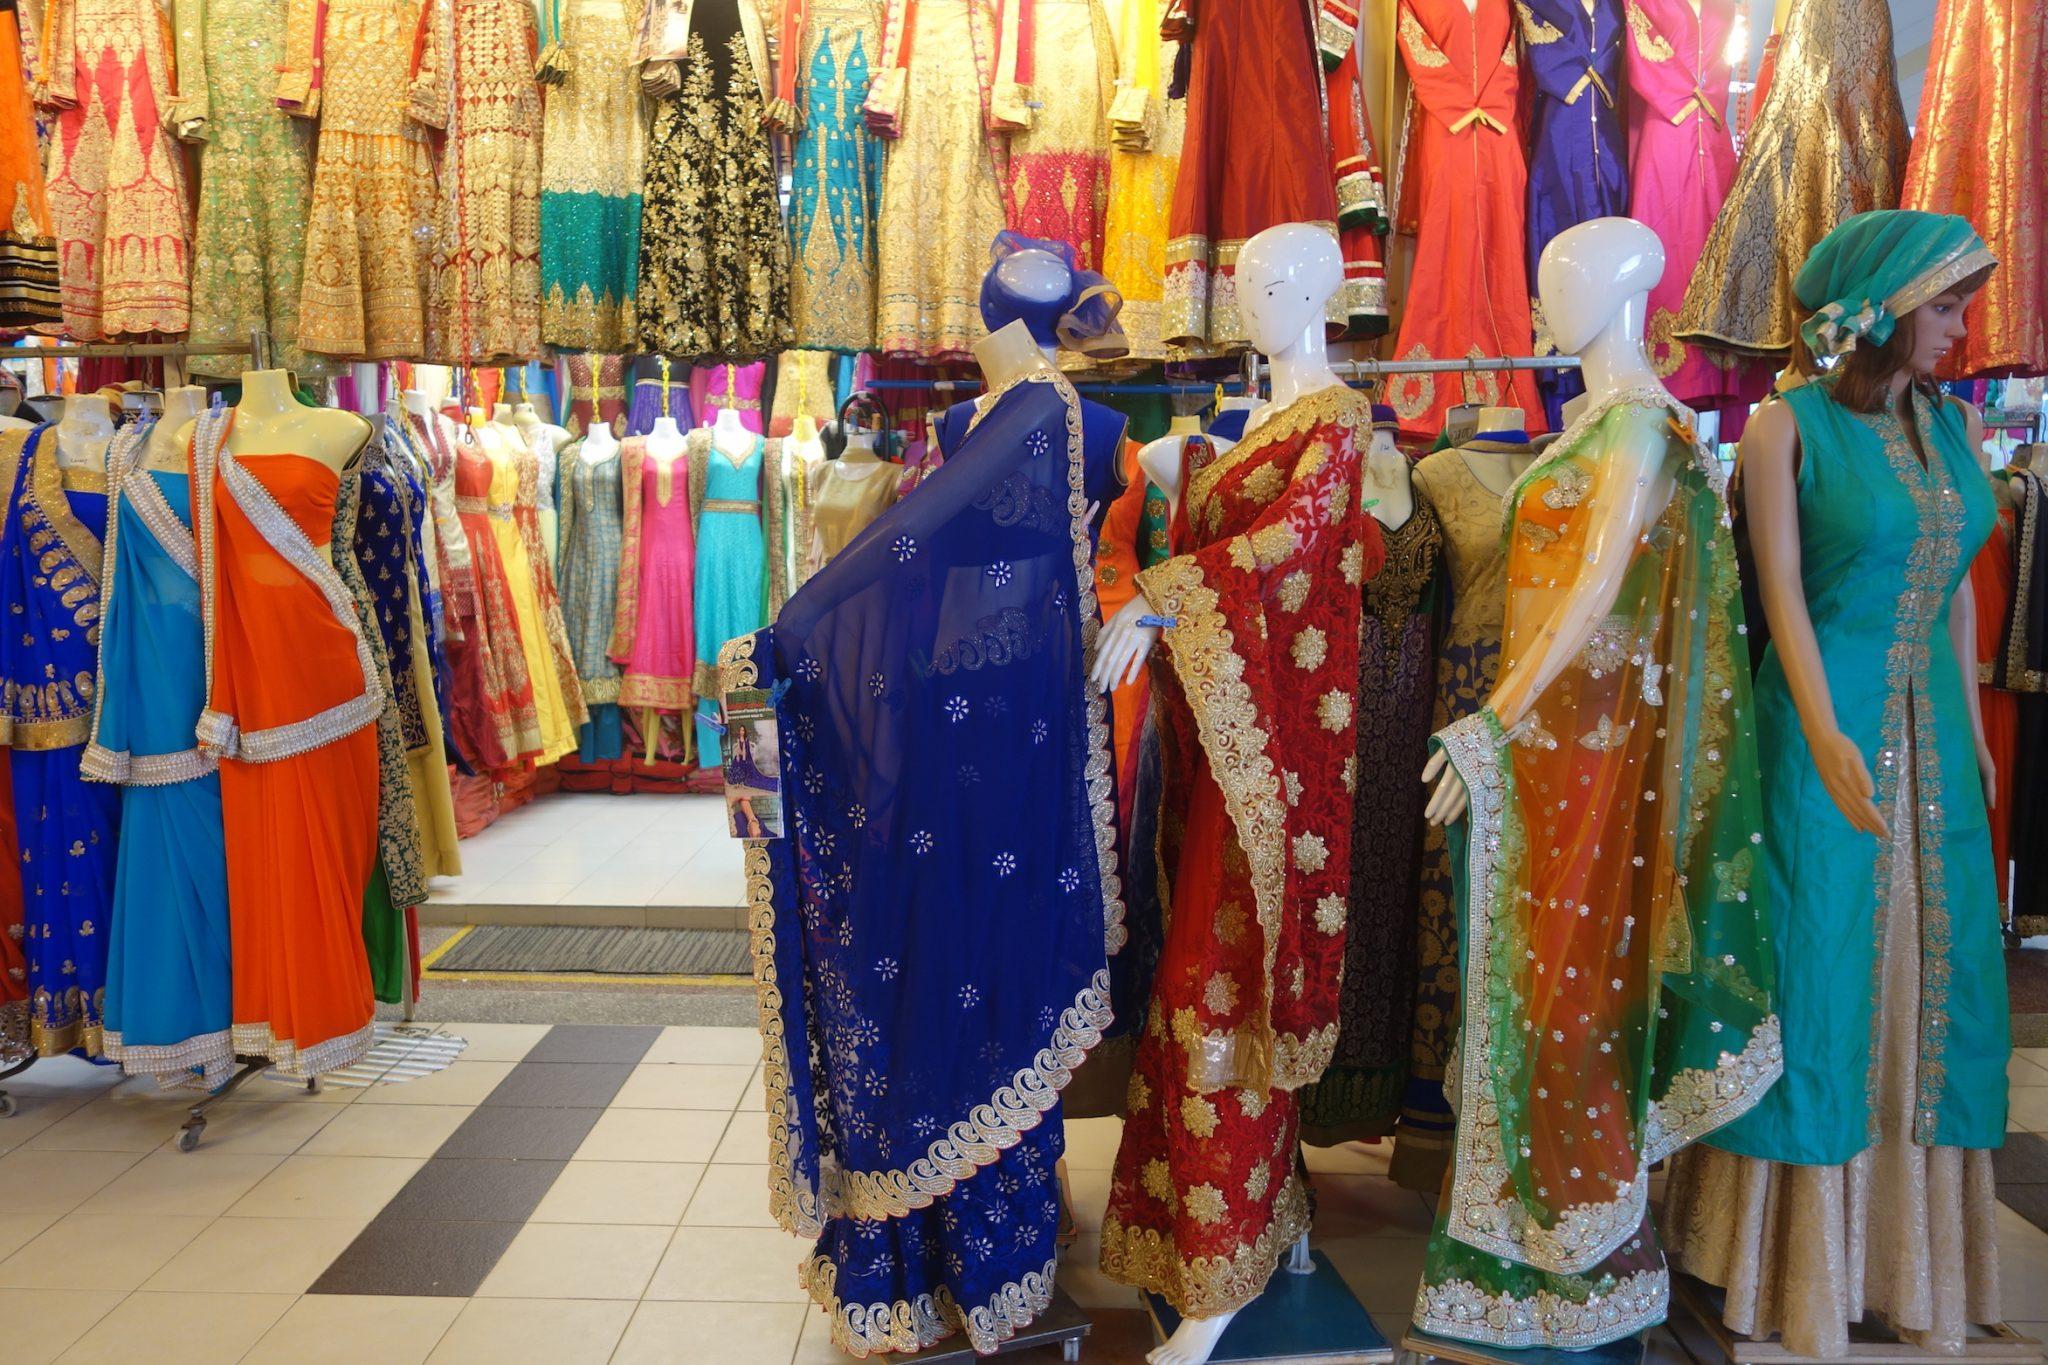 Singapur_LittleIndia_TekkaCentre_Sari_Kleidung